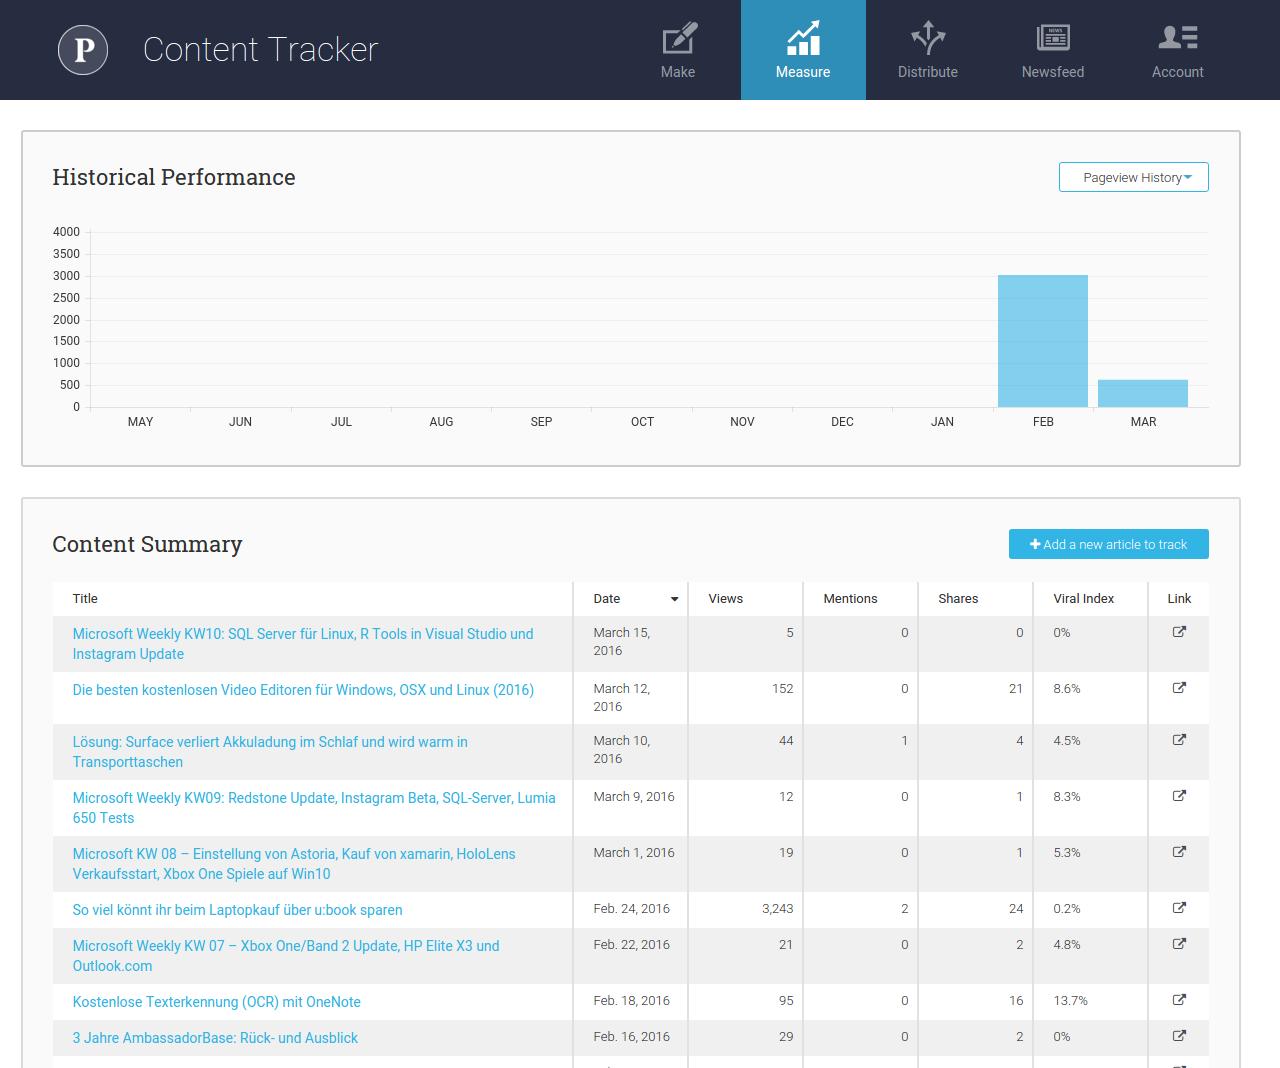 Priceonomics Content Tracker web app